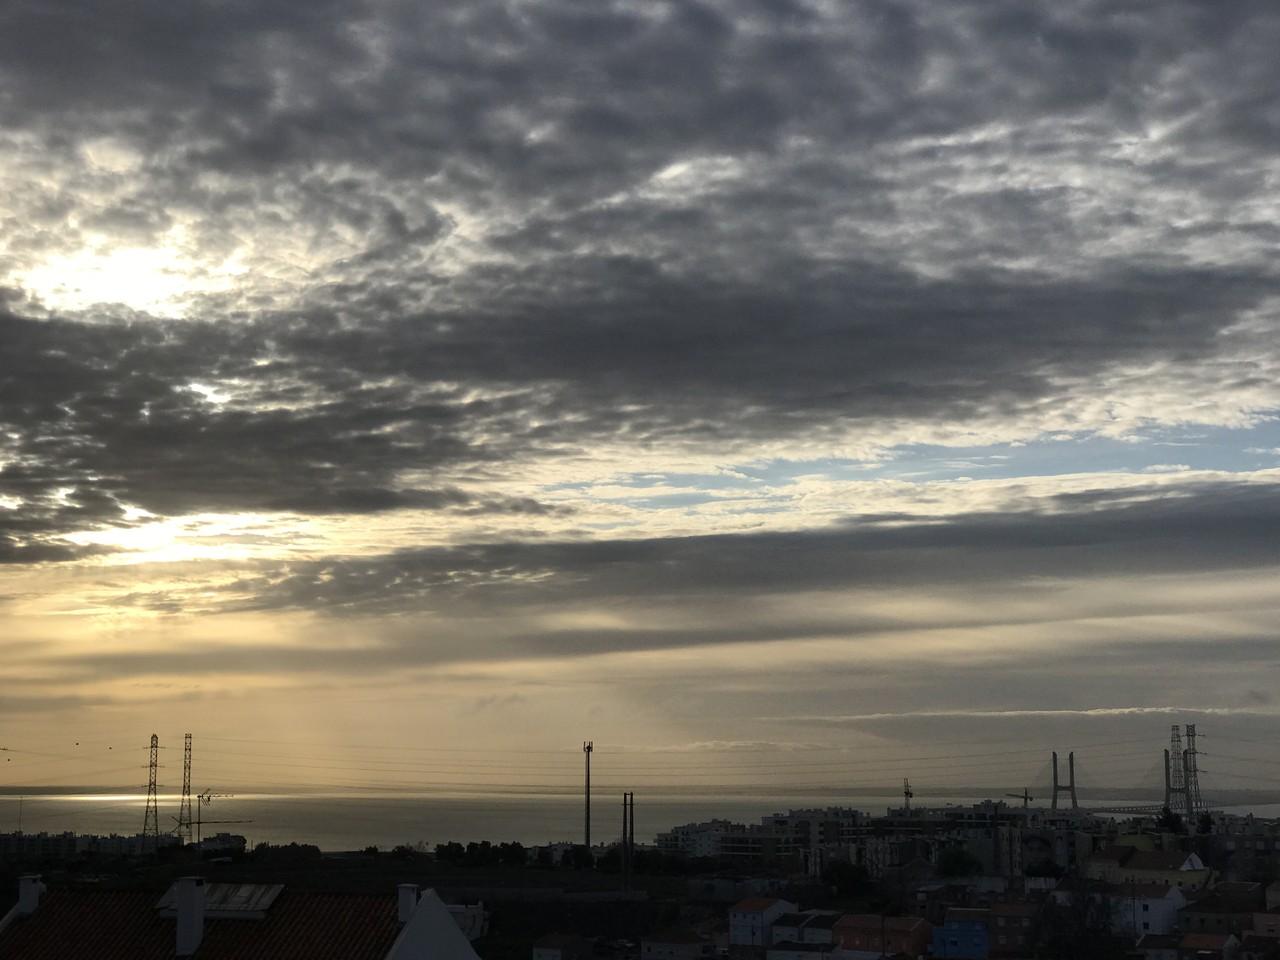 07:29